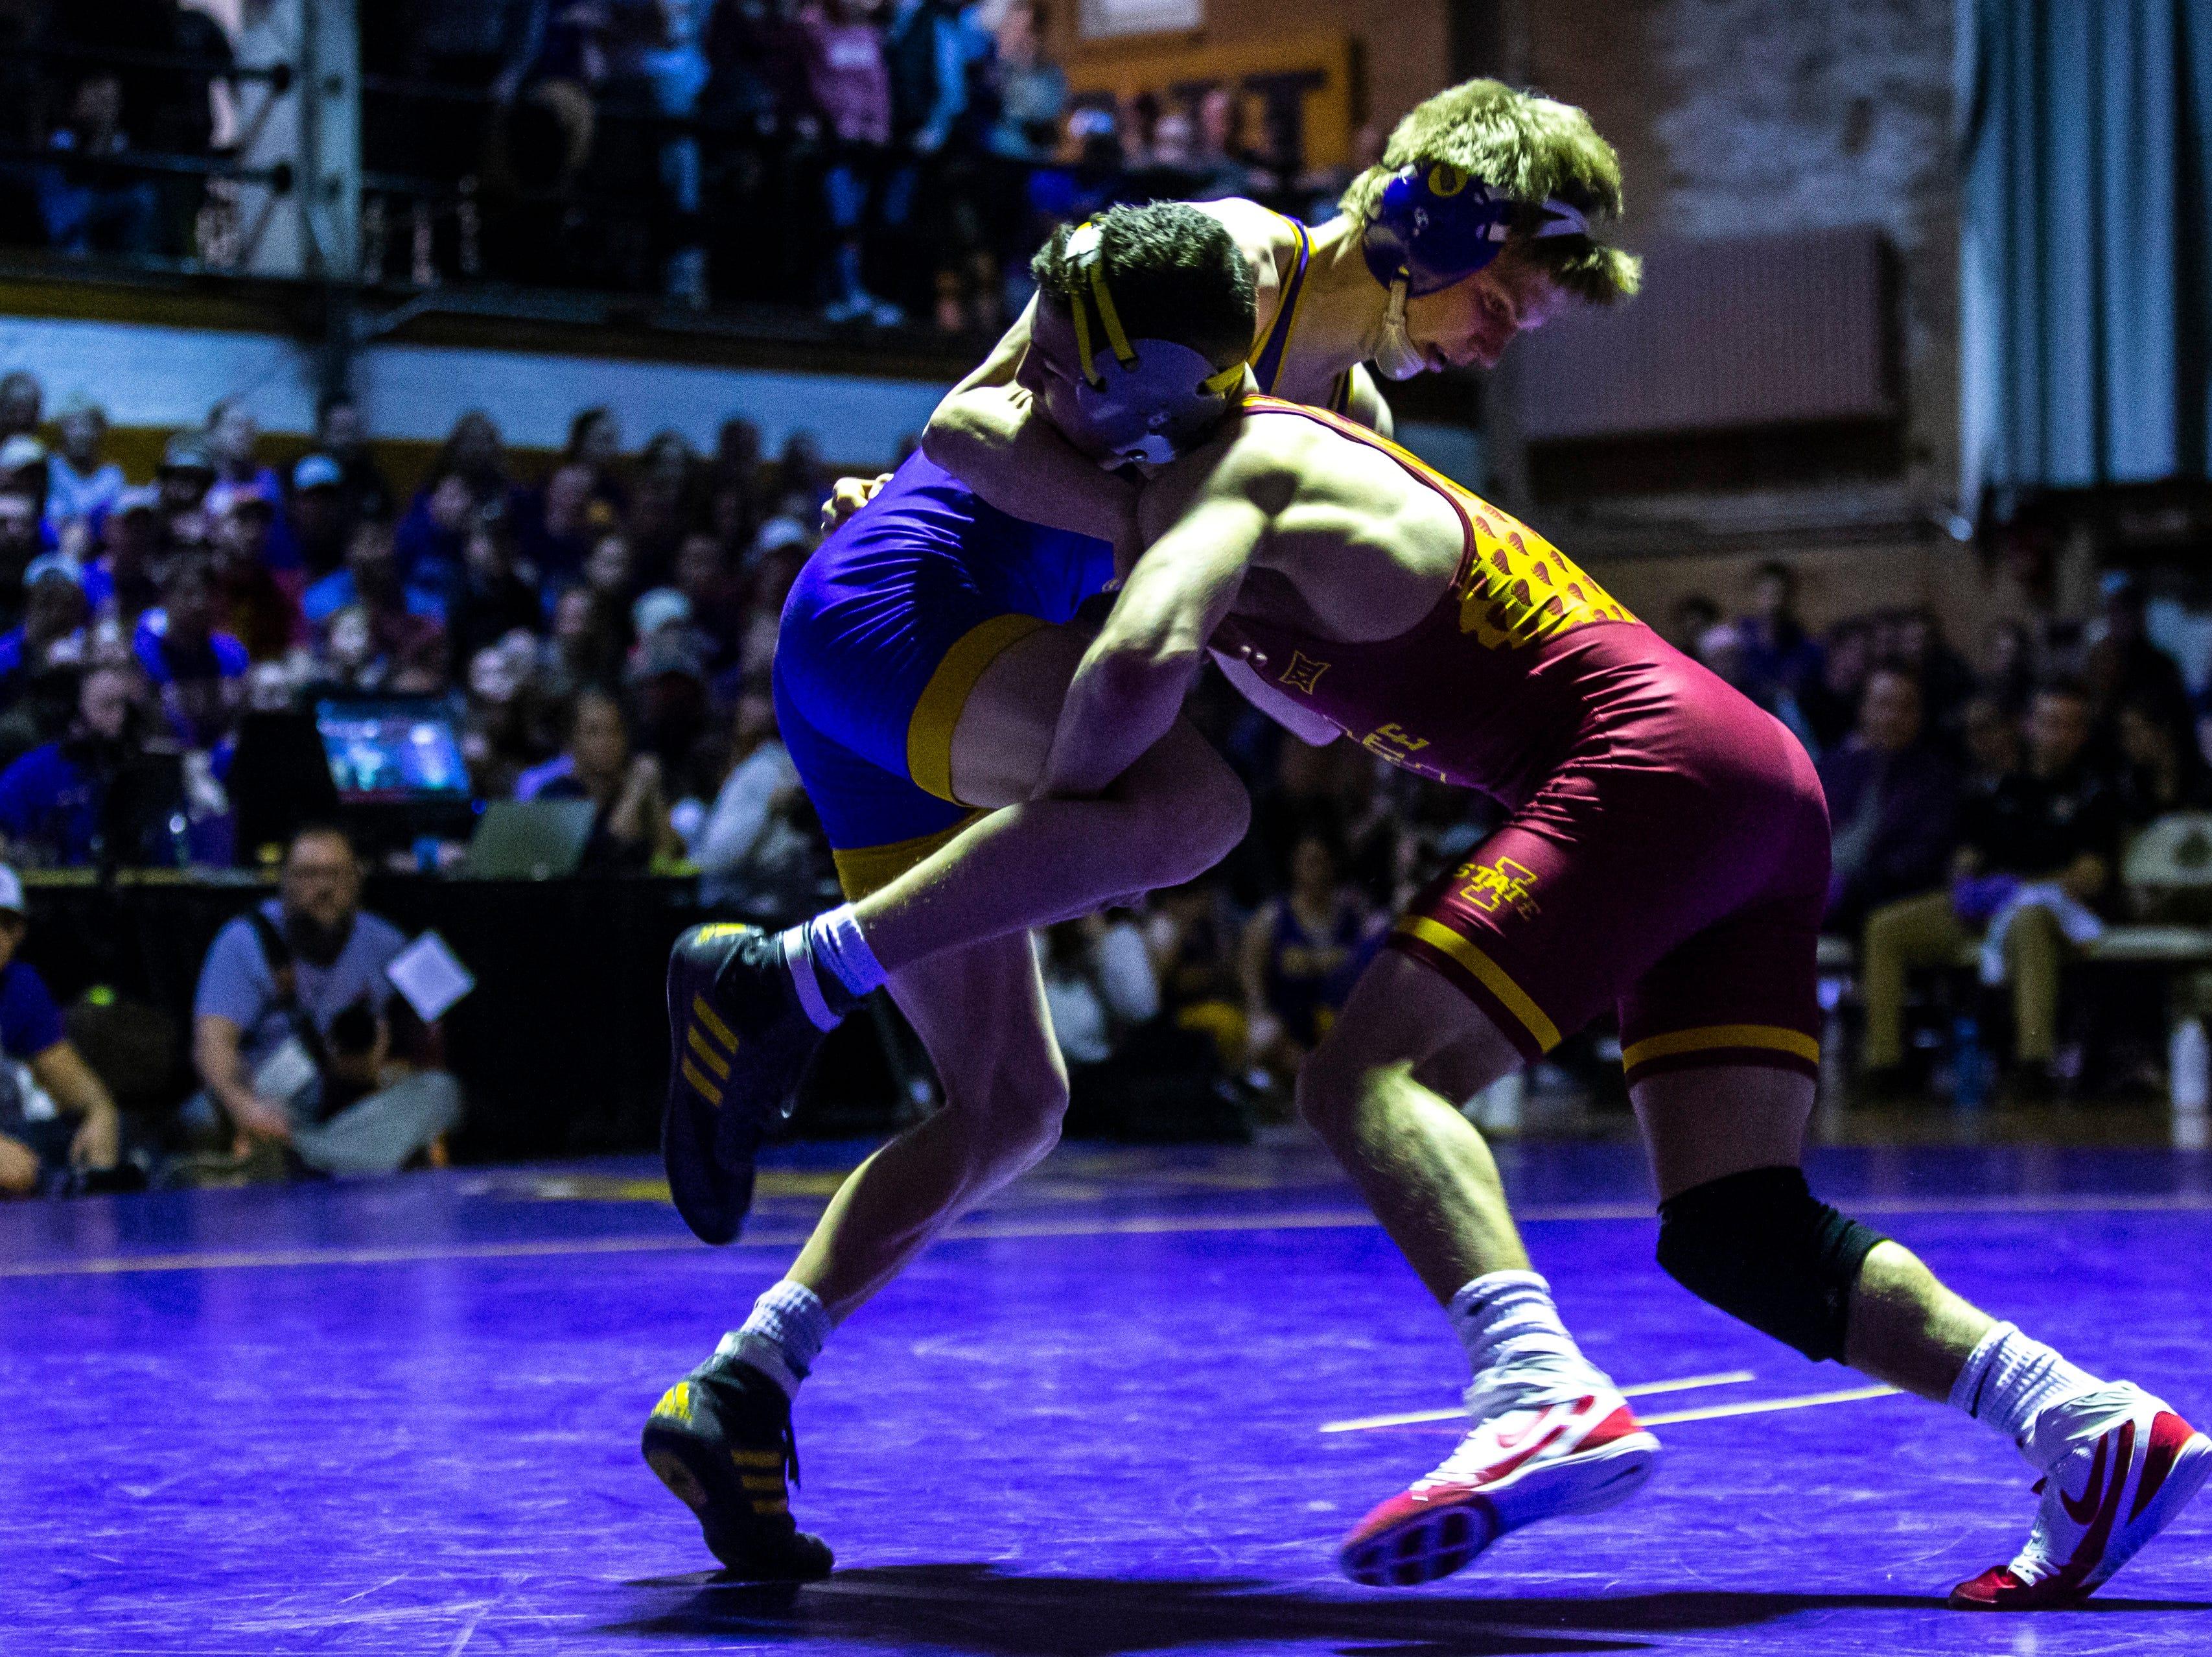 Northern Iowa's Jack Skudlarczyk wrestles Iowa State's Austin Gomez at 133 during a NCAA Big 12 wrestling dual on Thursday, Feb. 21, 2019 at the West Gymnasium in Cedar Falls, Iowa.